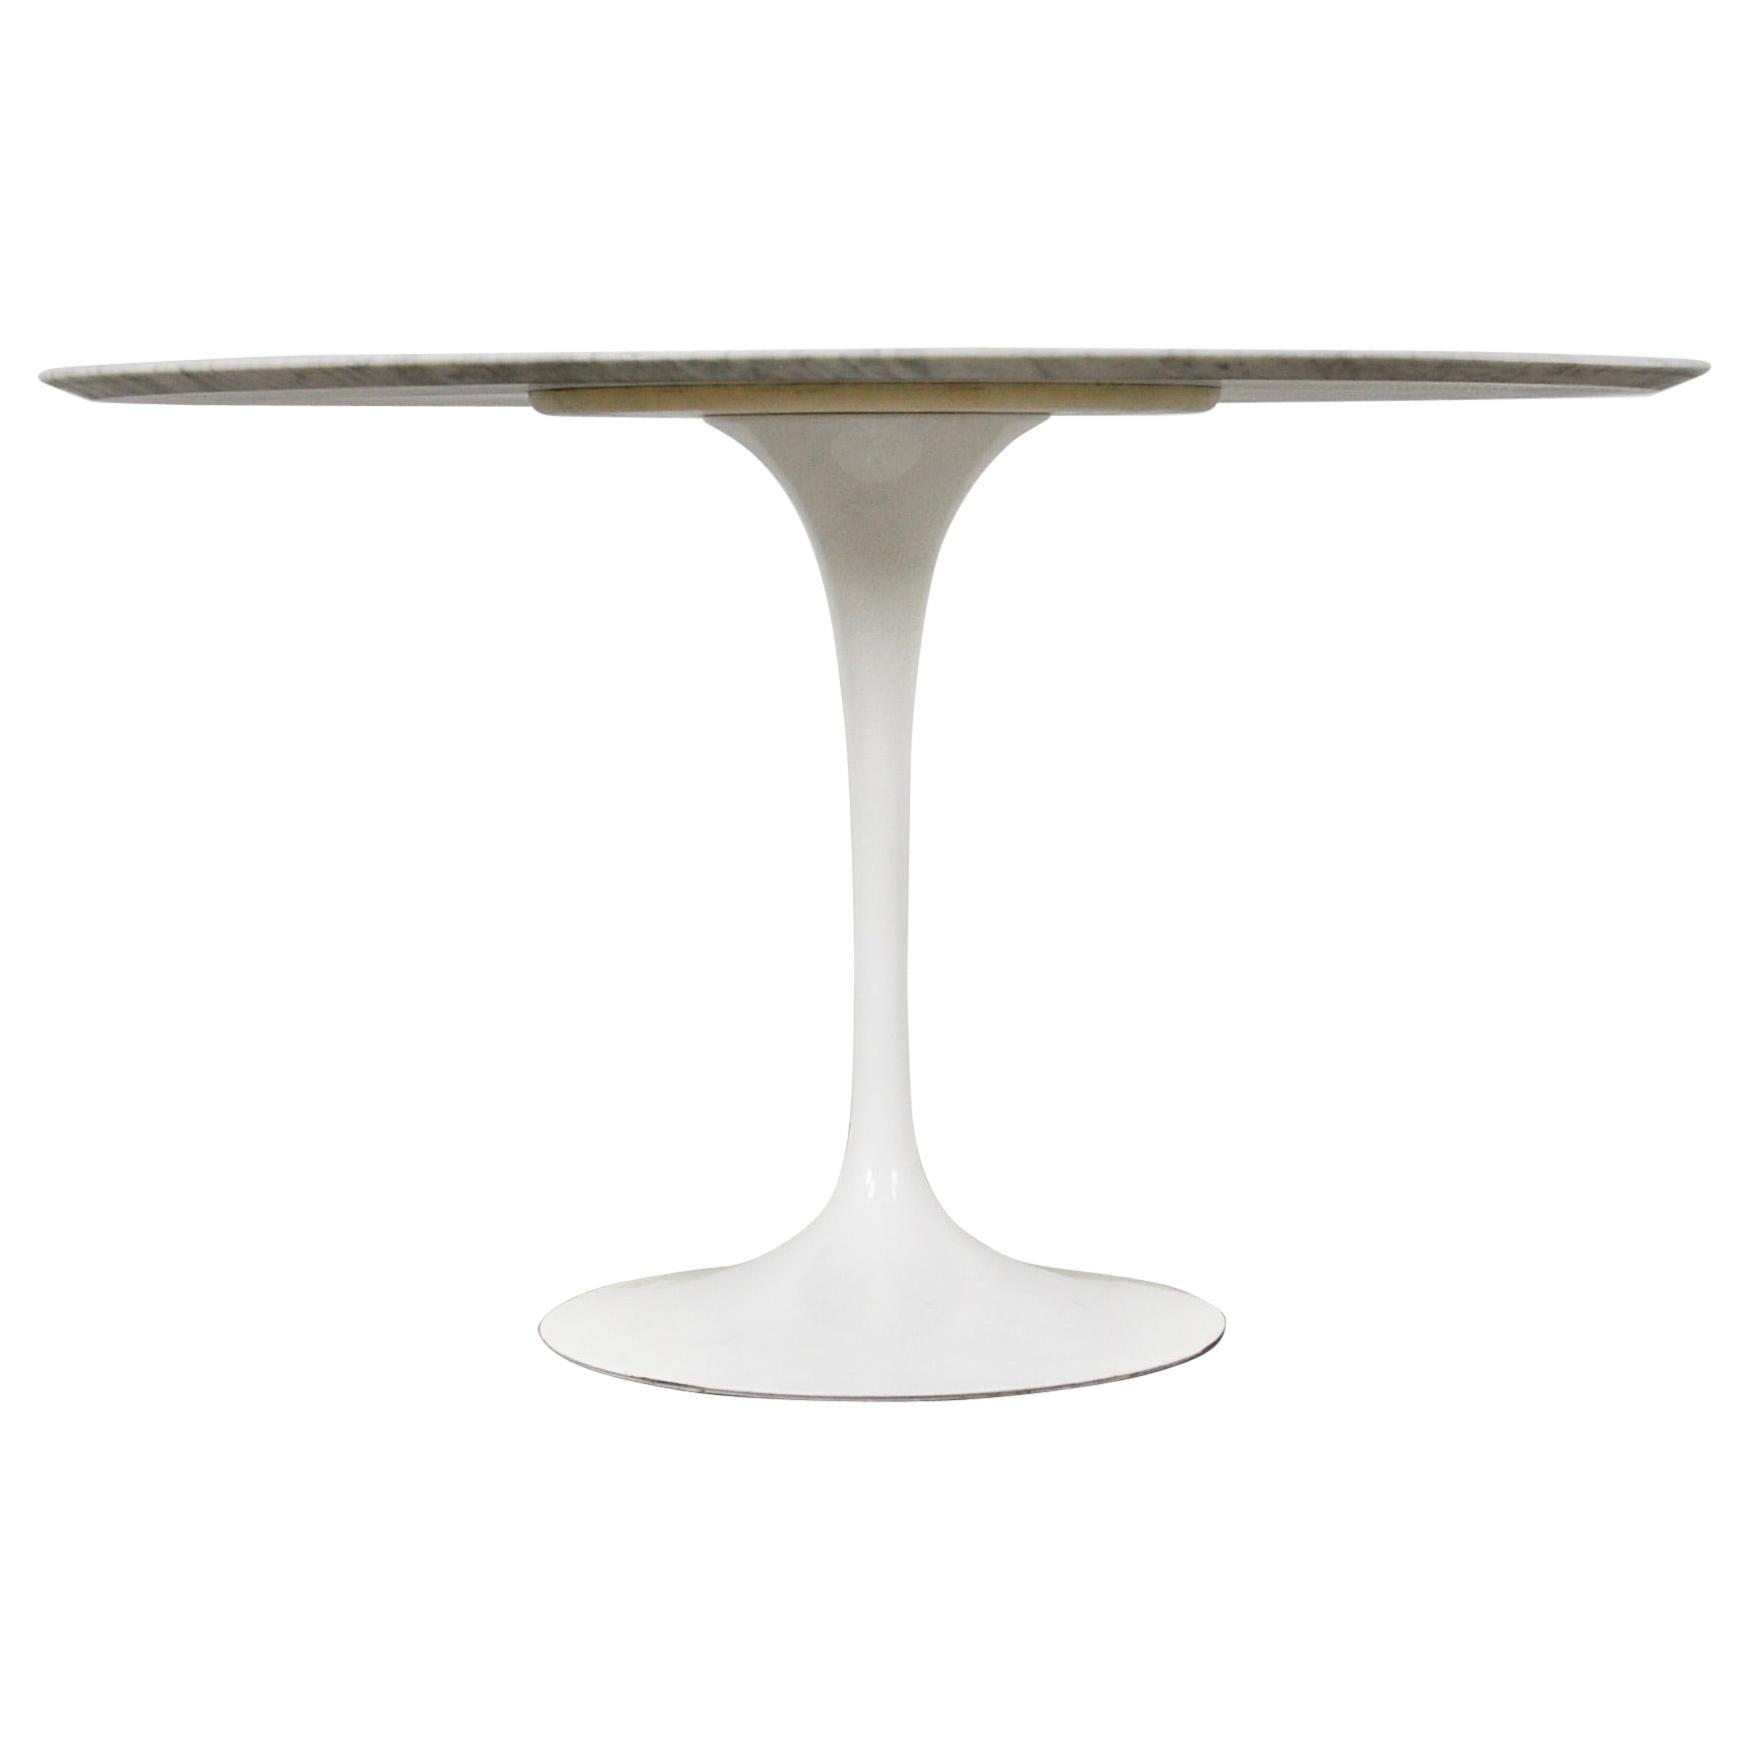 Dinning Table by Eero Saarinen for Knoll International, 1960s